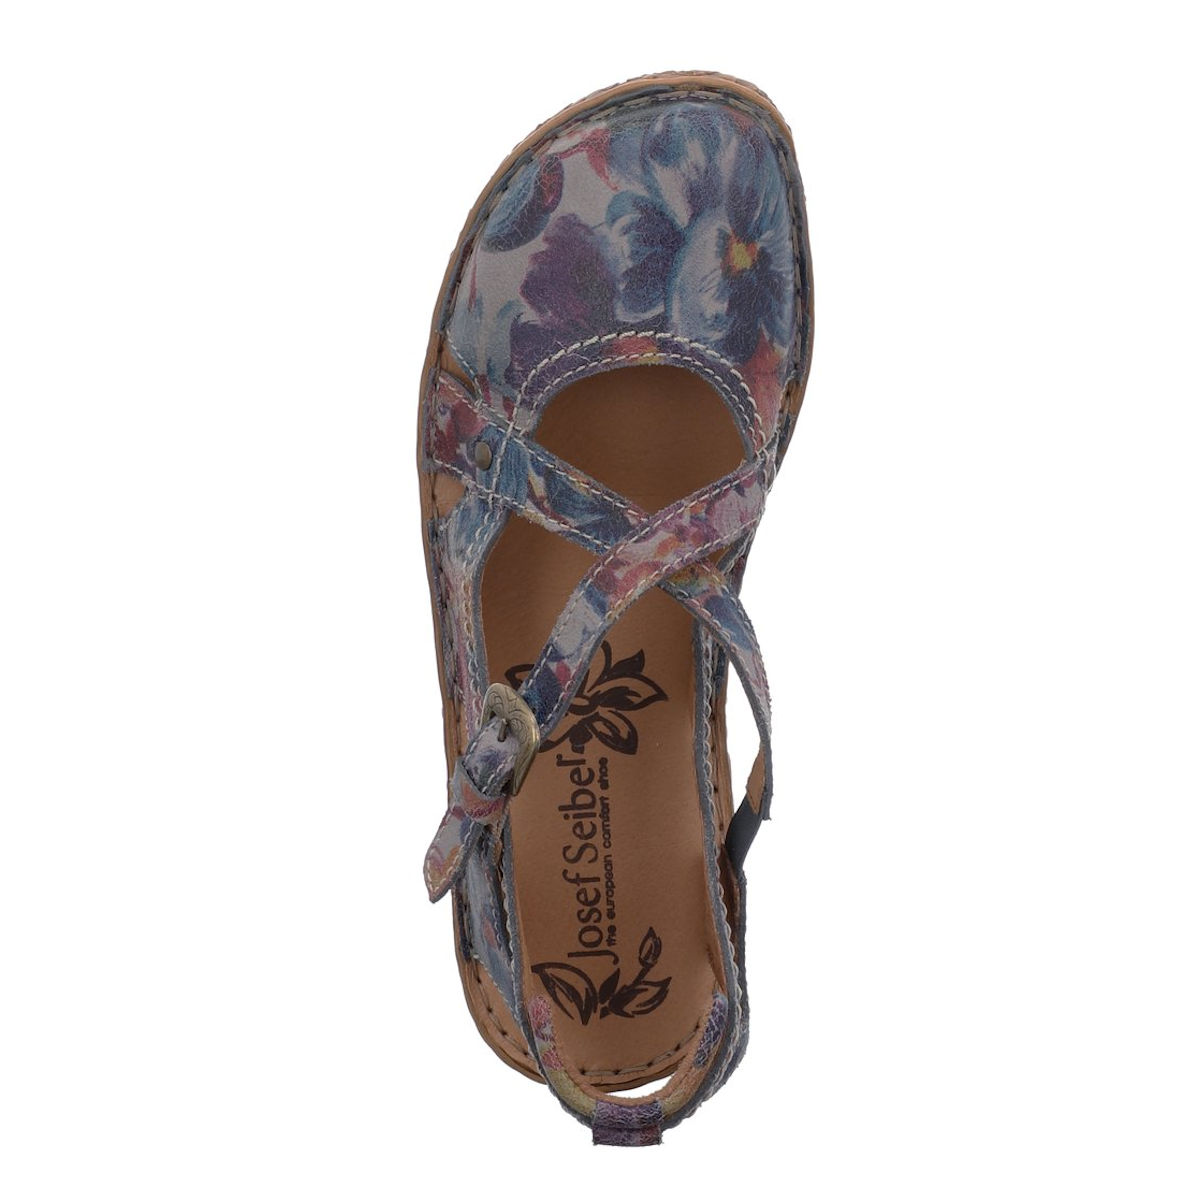 Josef Seibel Rosalie 13 Prints - Womens multi-coloured floral patterned leather closed toe sandals